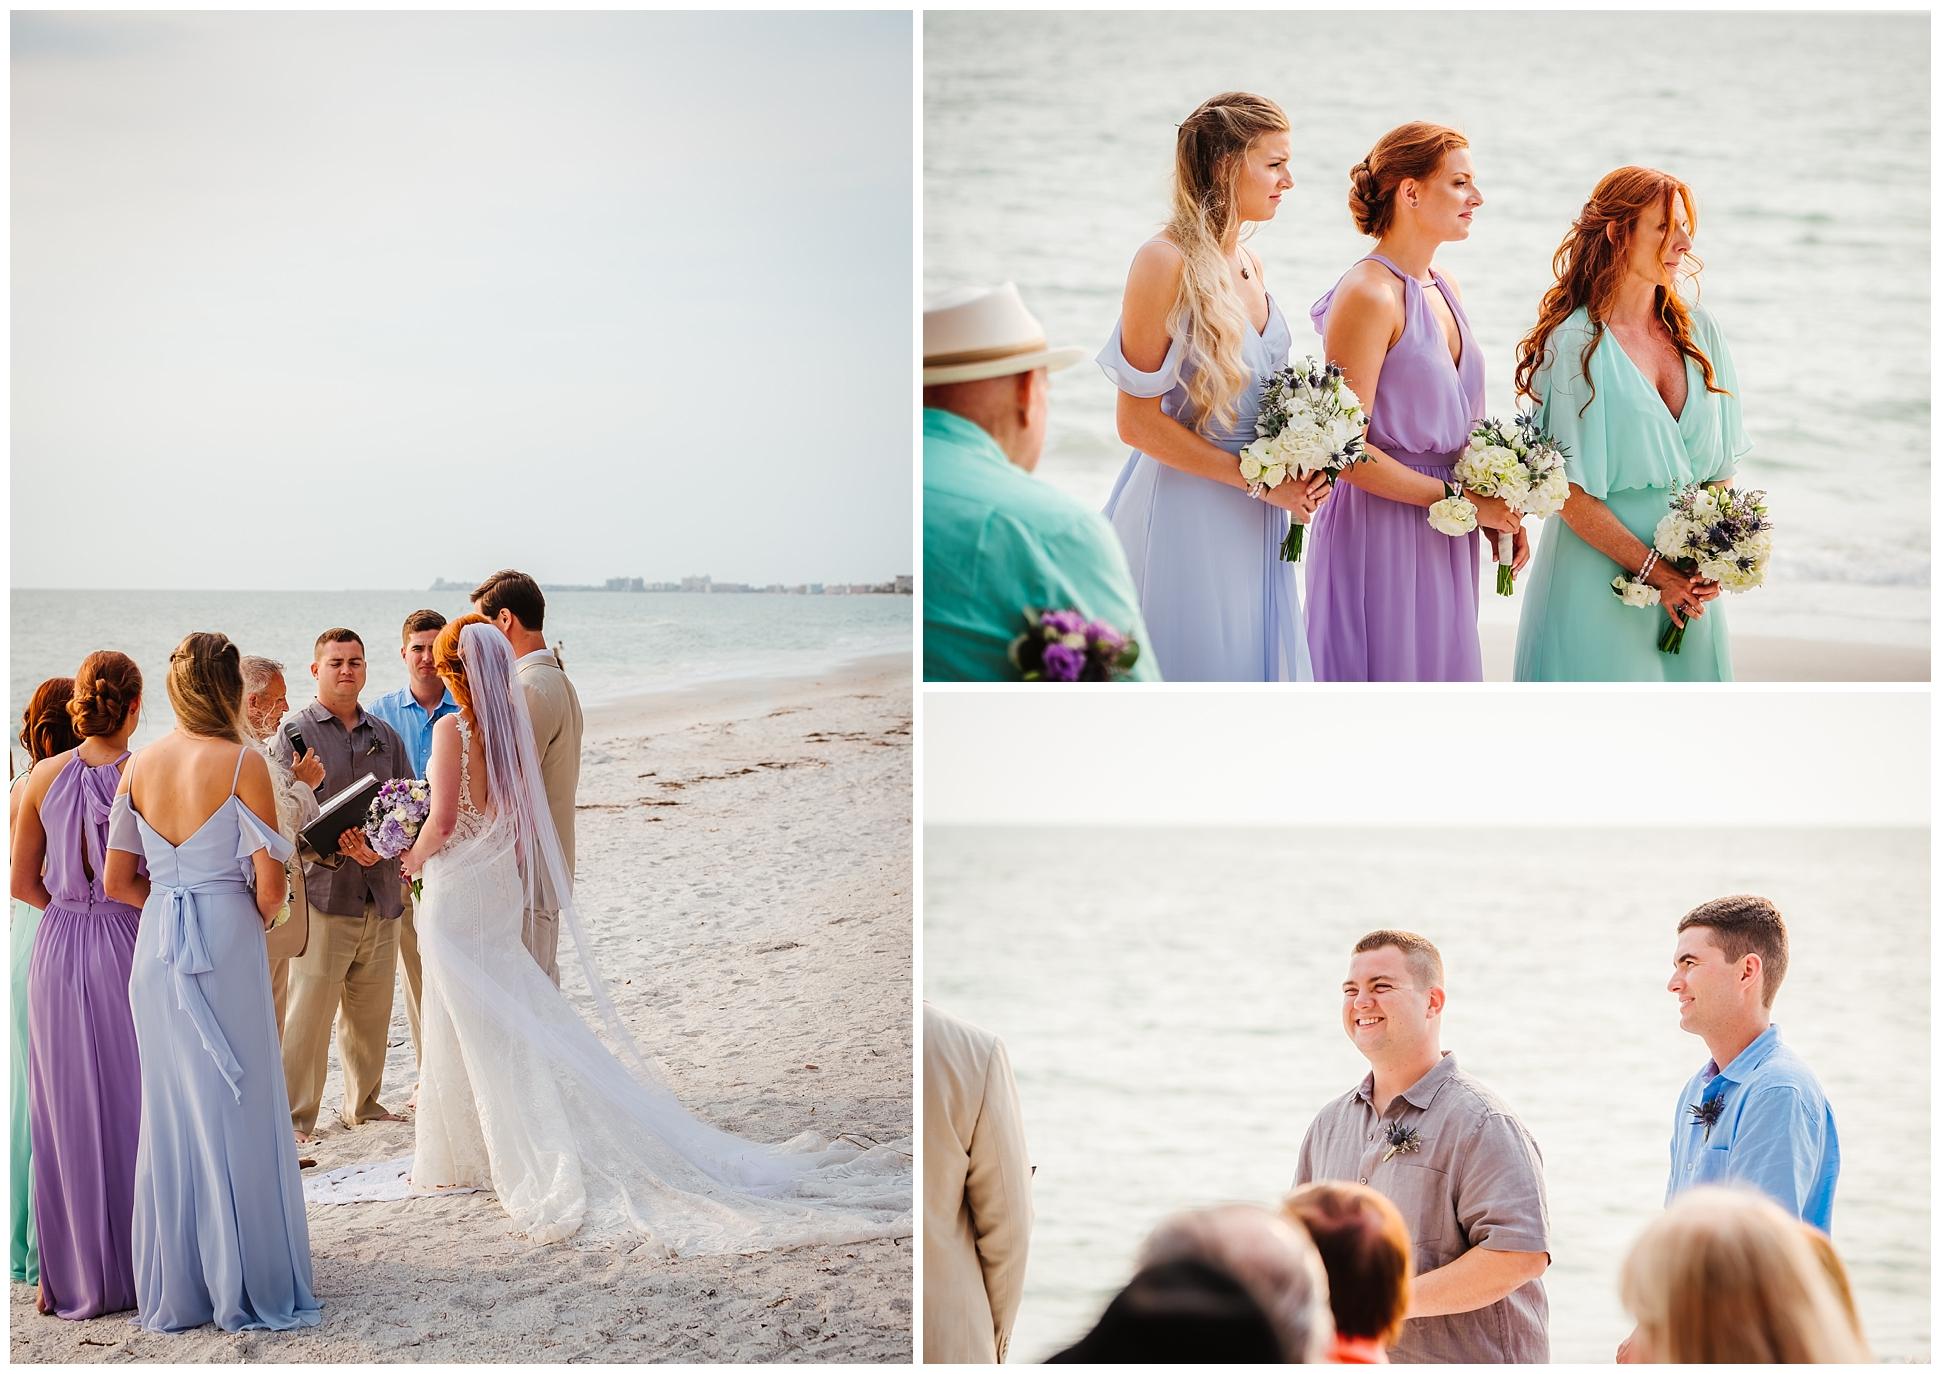 tampa-st-pete-wedding-photographer-indian-rocks-beach-mermaid-train-redhead_0132.jpg